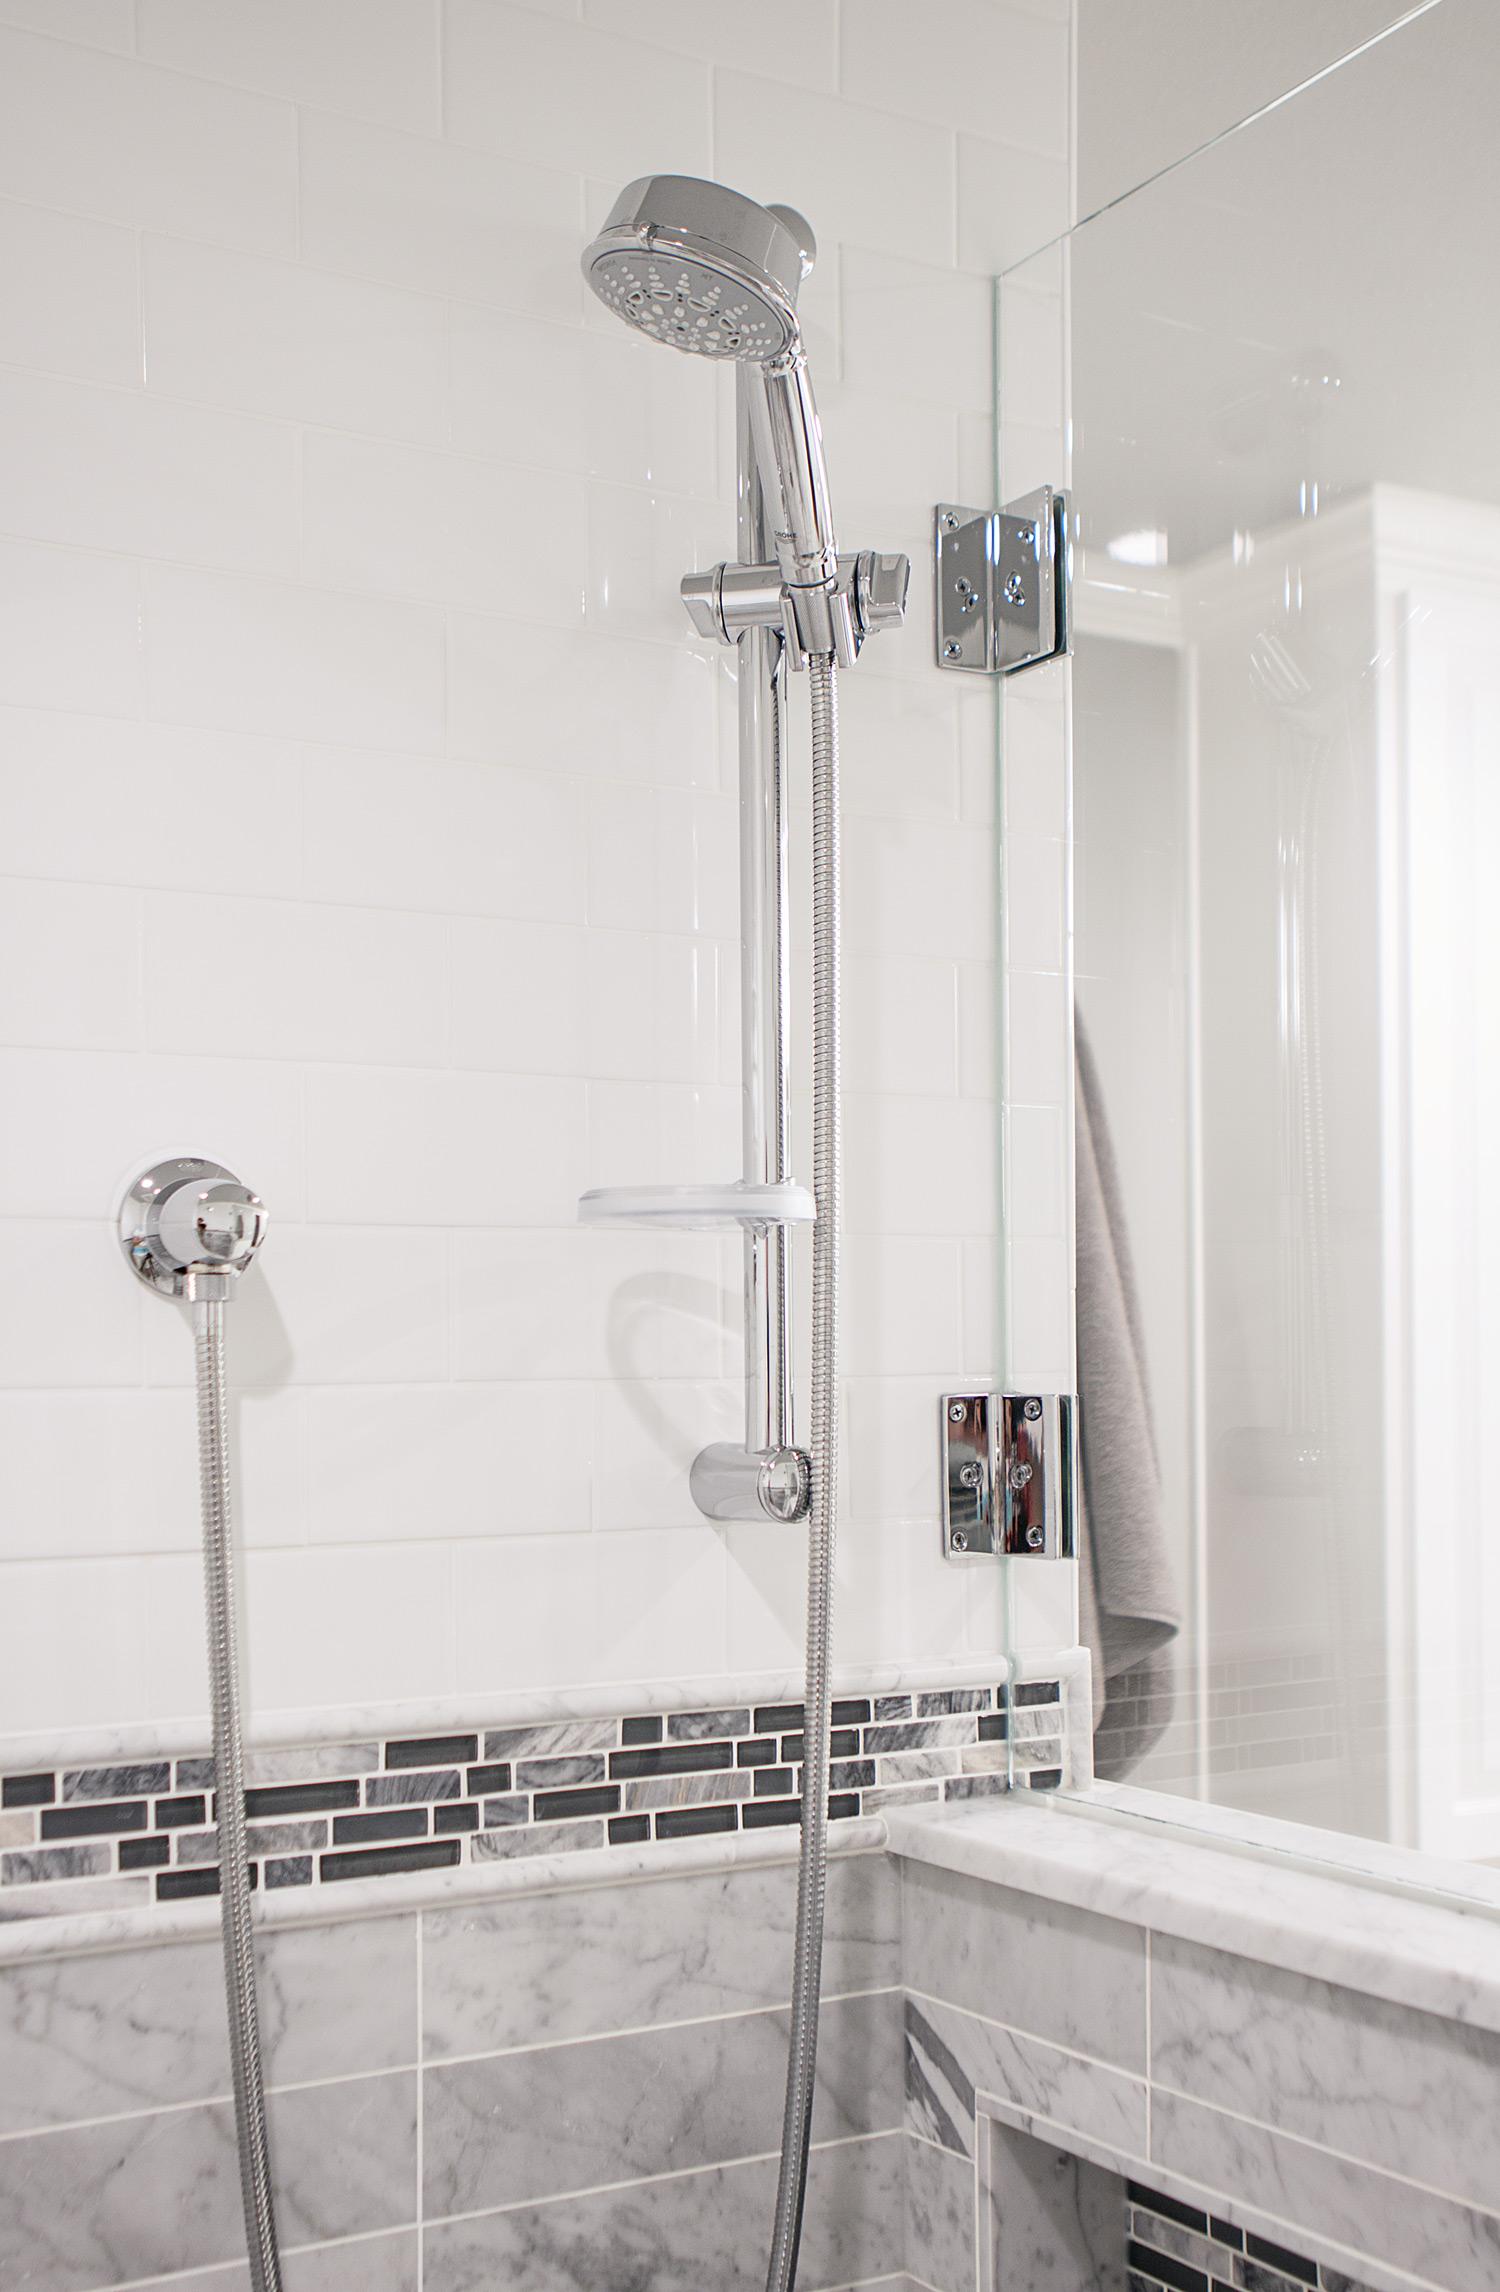 Bath-Detail-Plumbing-Shower-Handheld-1.2.jpg